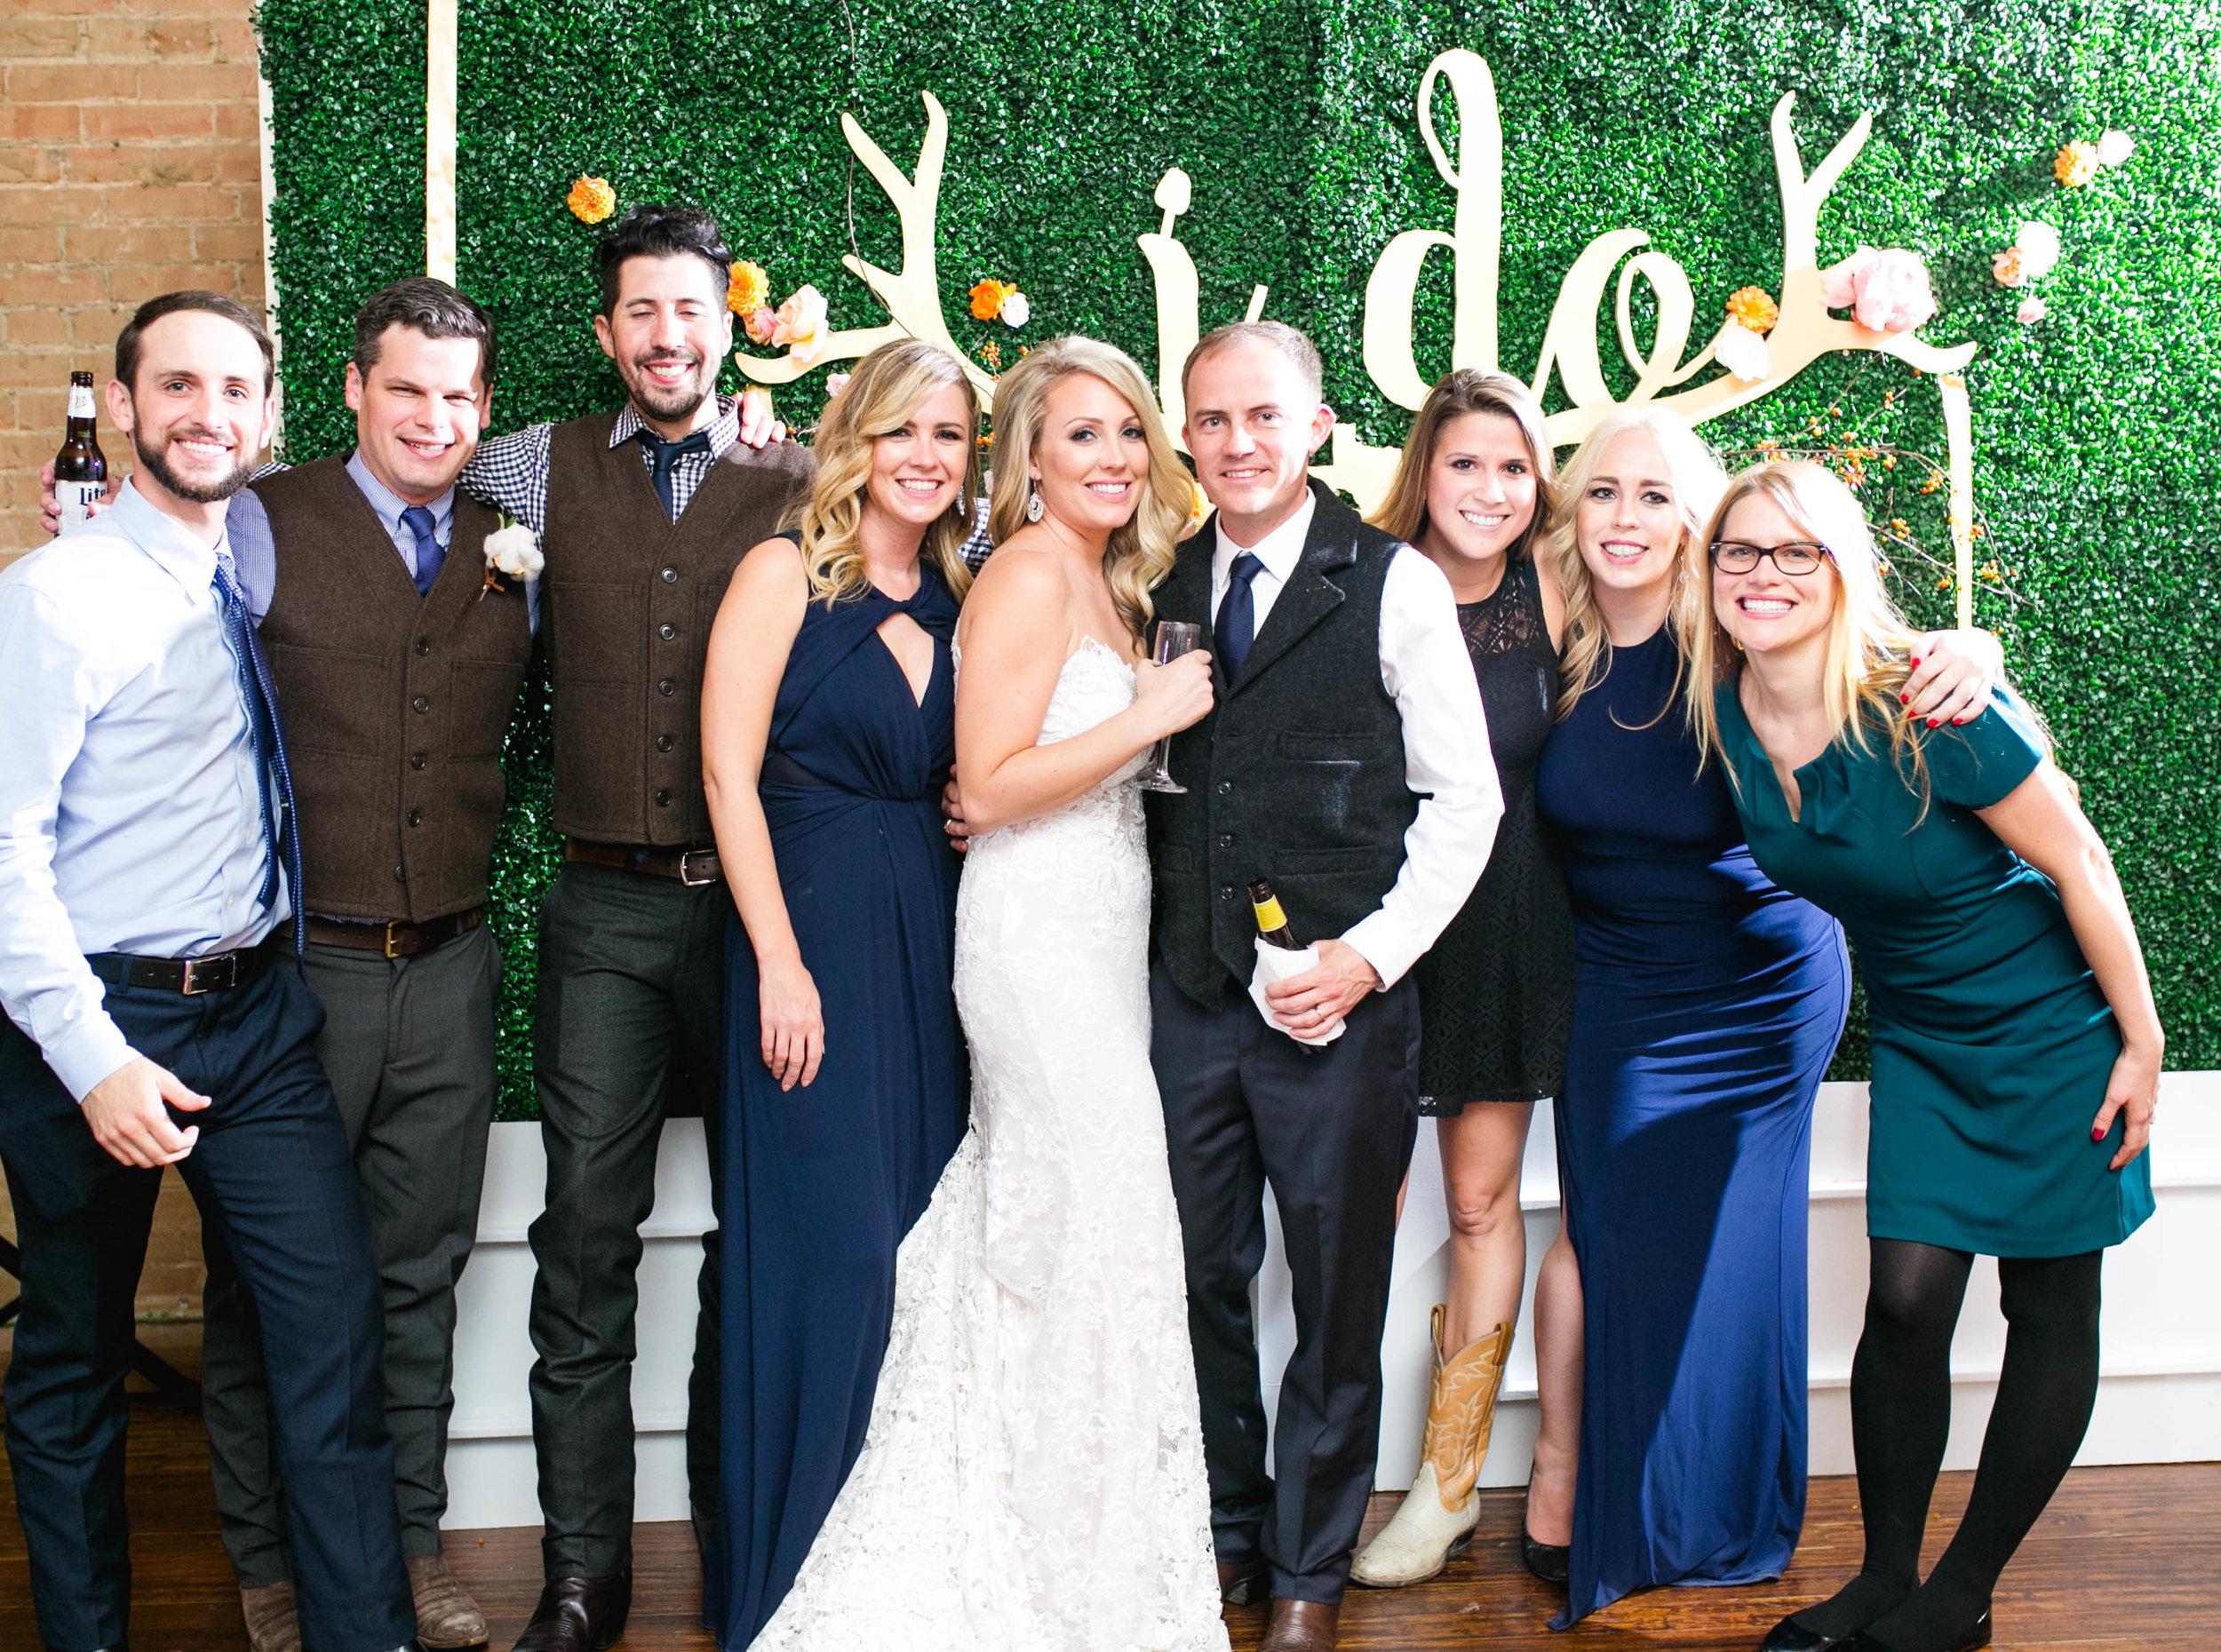 Bridal Party I Do Sign